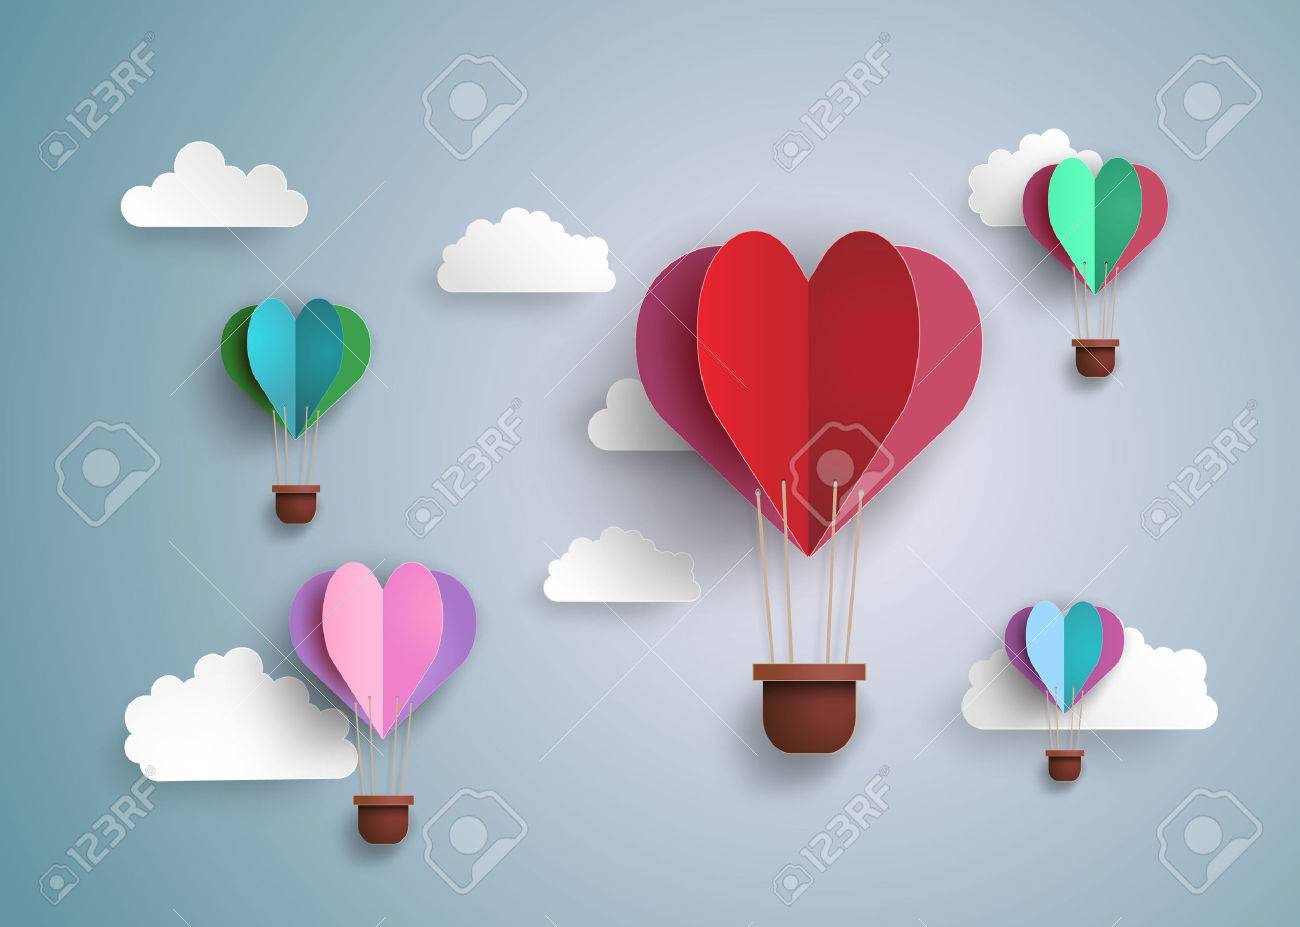 Origami made hot air balloon in a heart shape. - 52336340